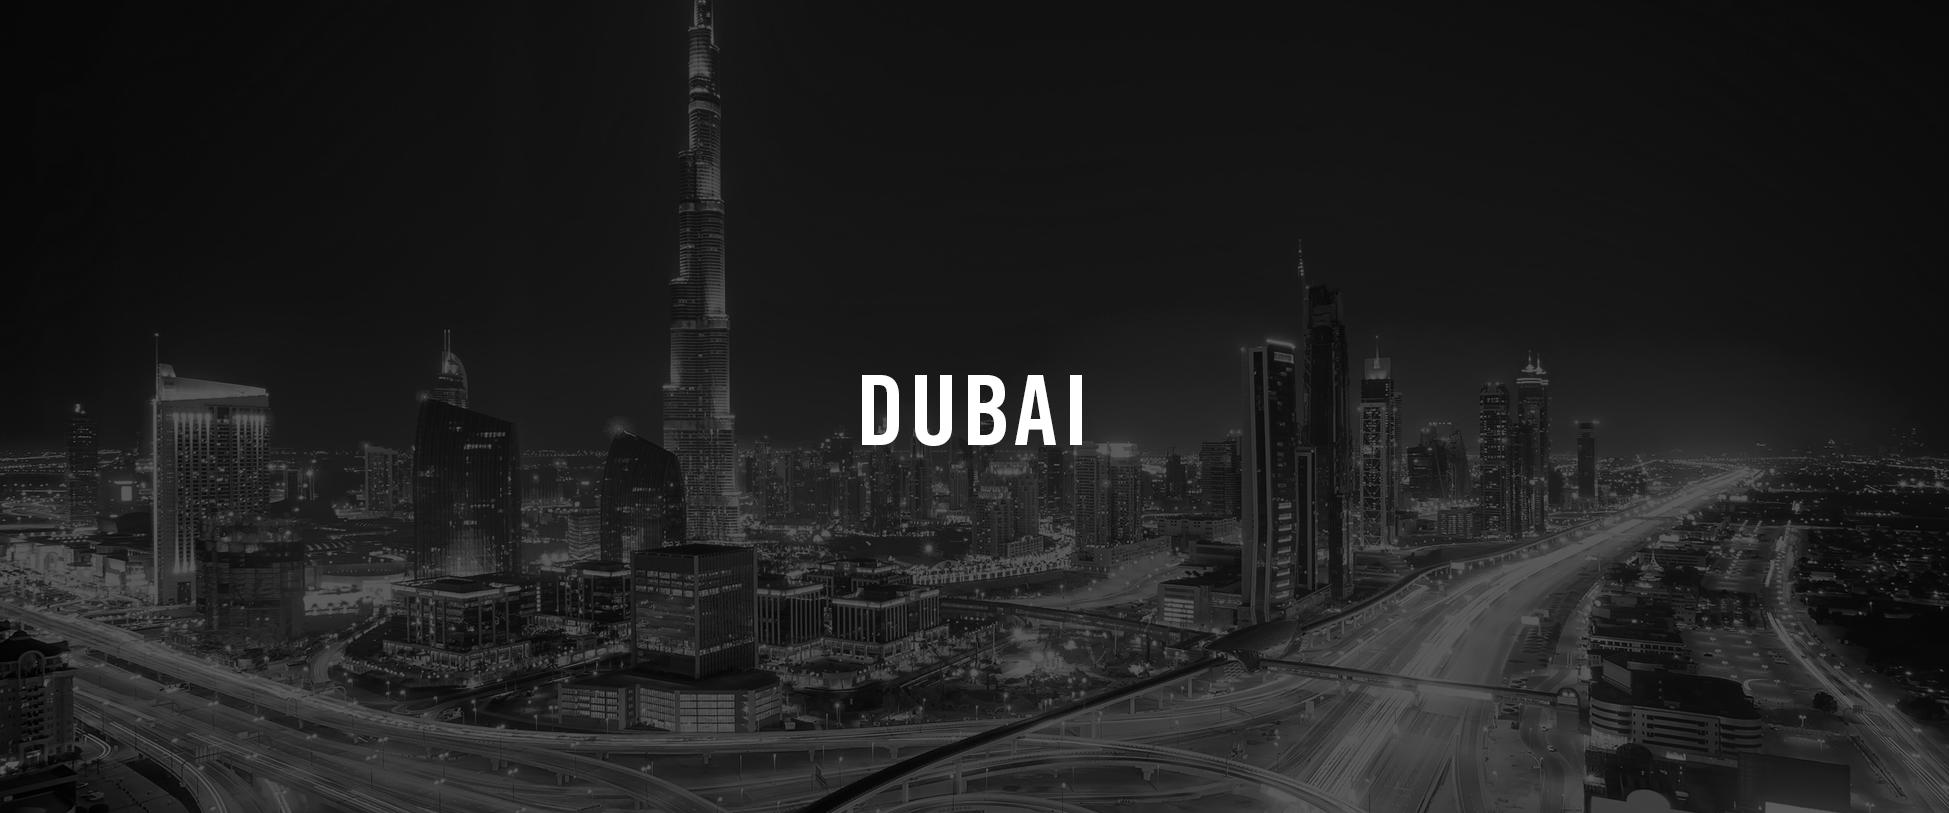 DubaiHeader.png